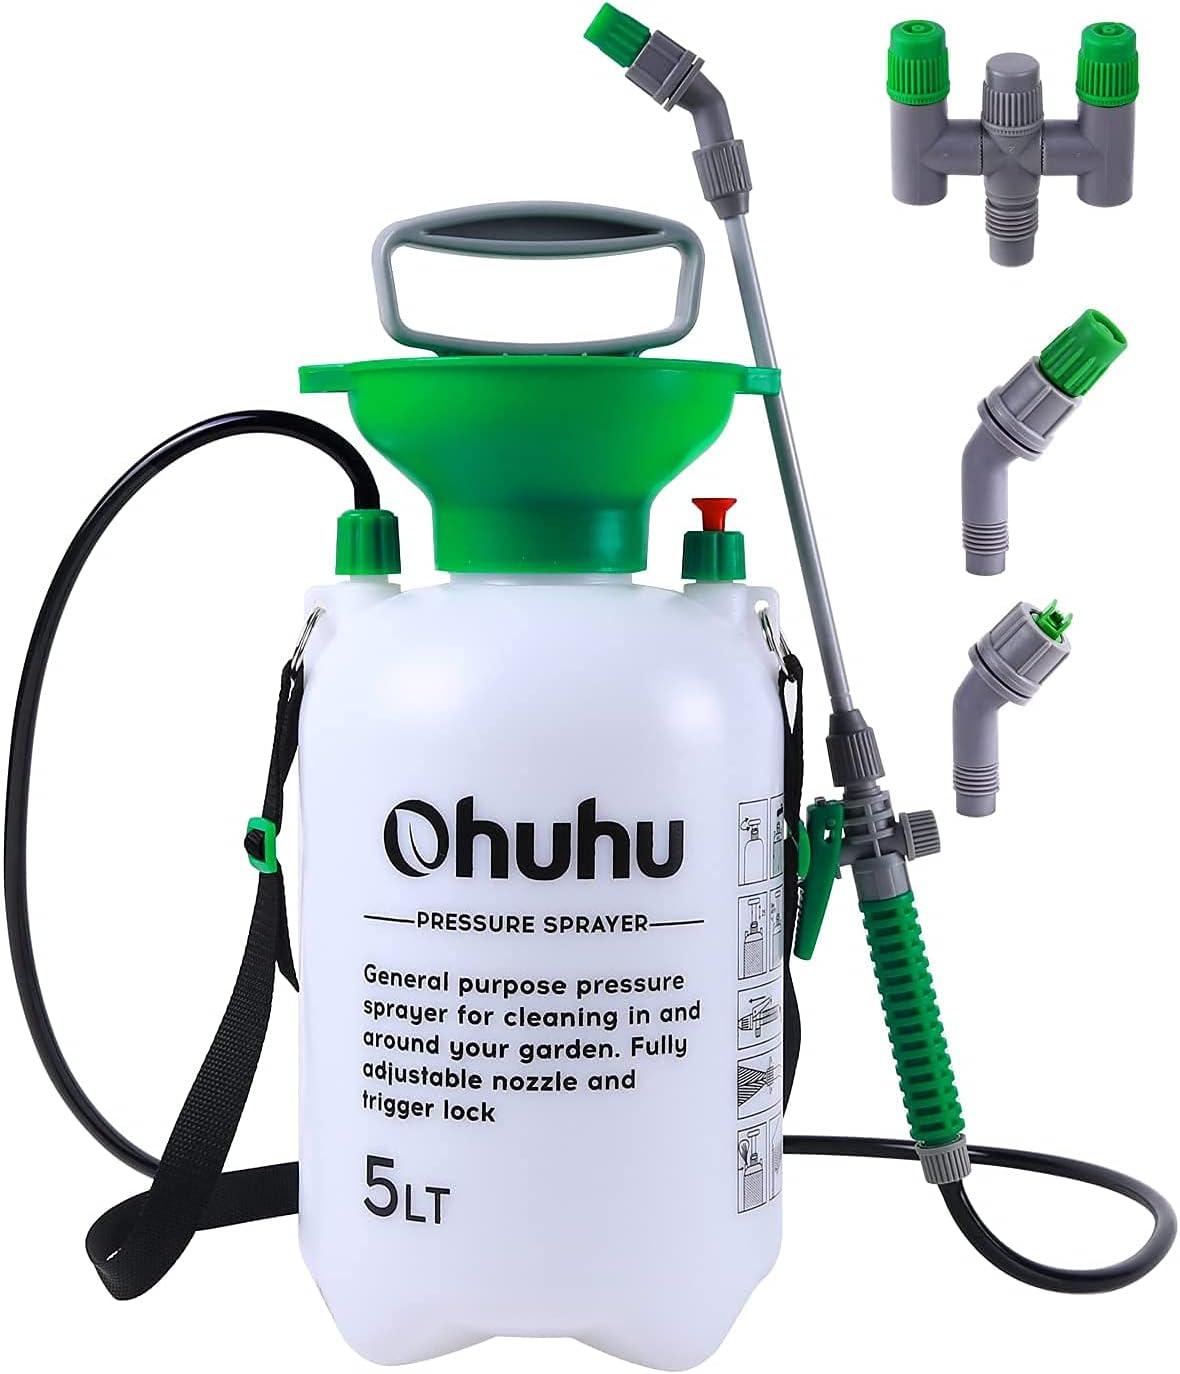 Pump Sprayer, Ohuhu1.3 Gallon/5L Multi-Purpose Lawn & Garden Pressure Sprayer with 2 Different Nozzles, Pressure Relief Valve & Adjustable Shoulder Strap for Fertilizers, Watering Plants, Cleaning